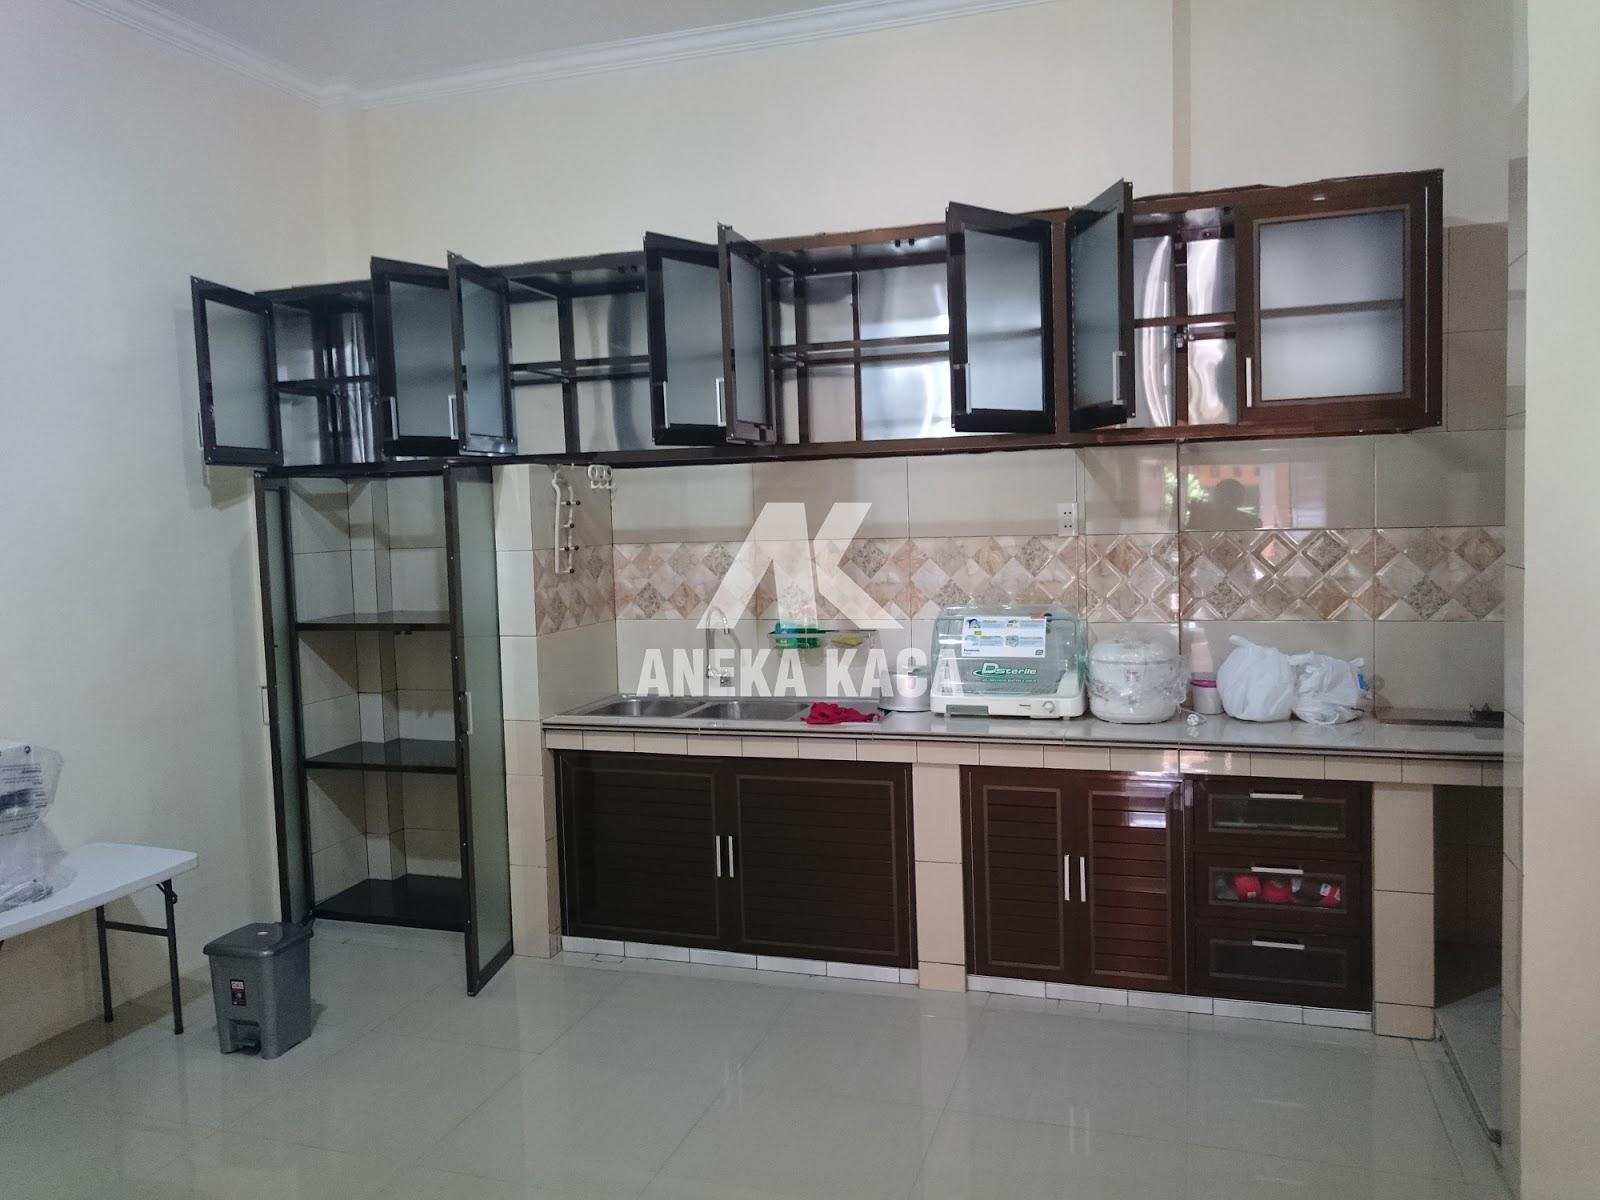 Jual Toko Aneka Kaca Kitchen Set Aluminium Lemari Piring Harga